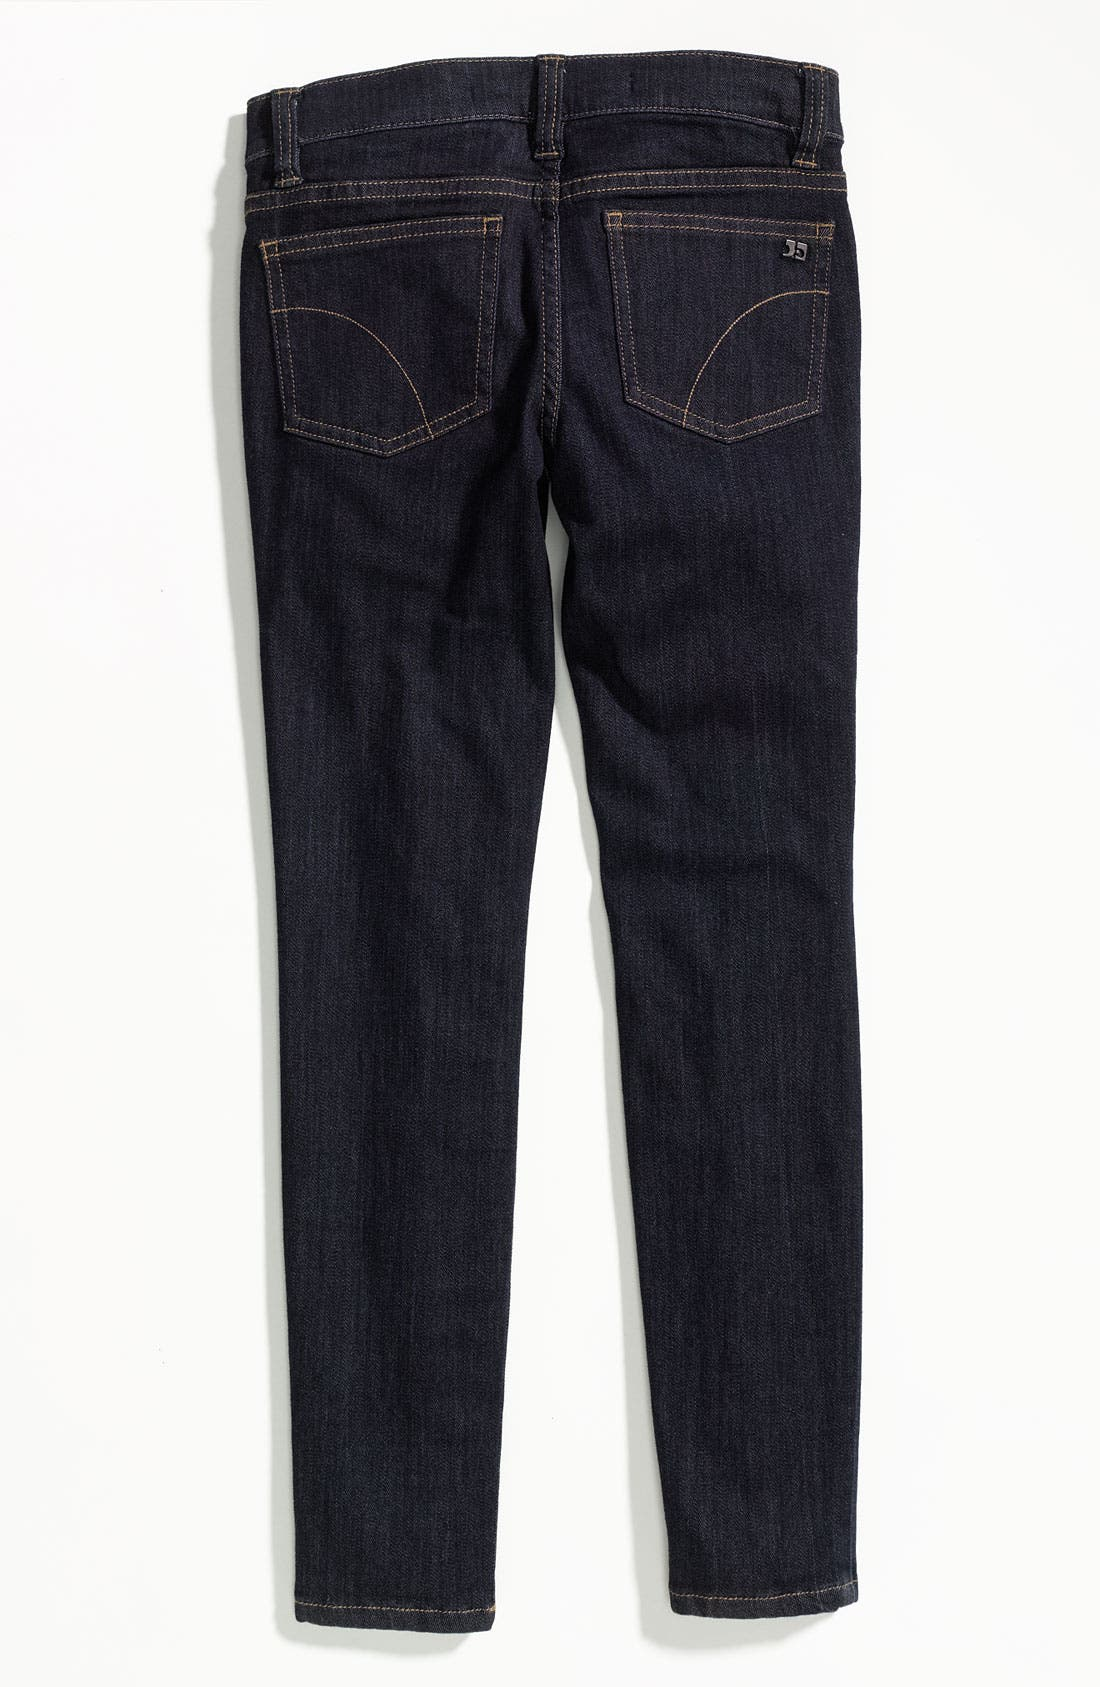 Alternate Image 1 Selected - Joe's 'Supersmooth' Super Skinny Jeans (Big Girls)